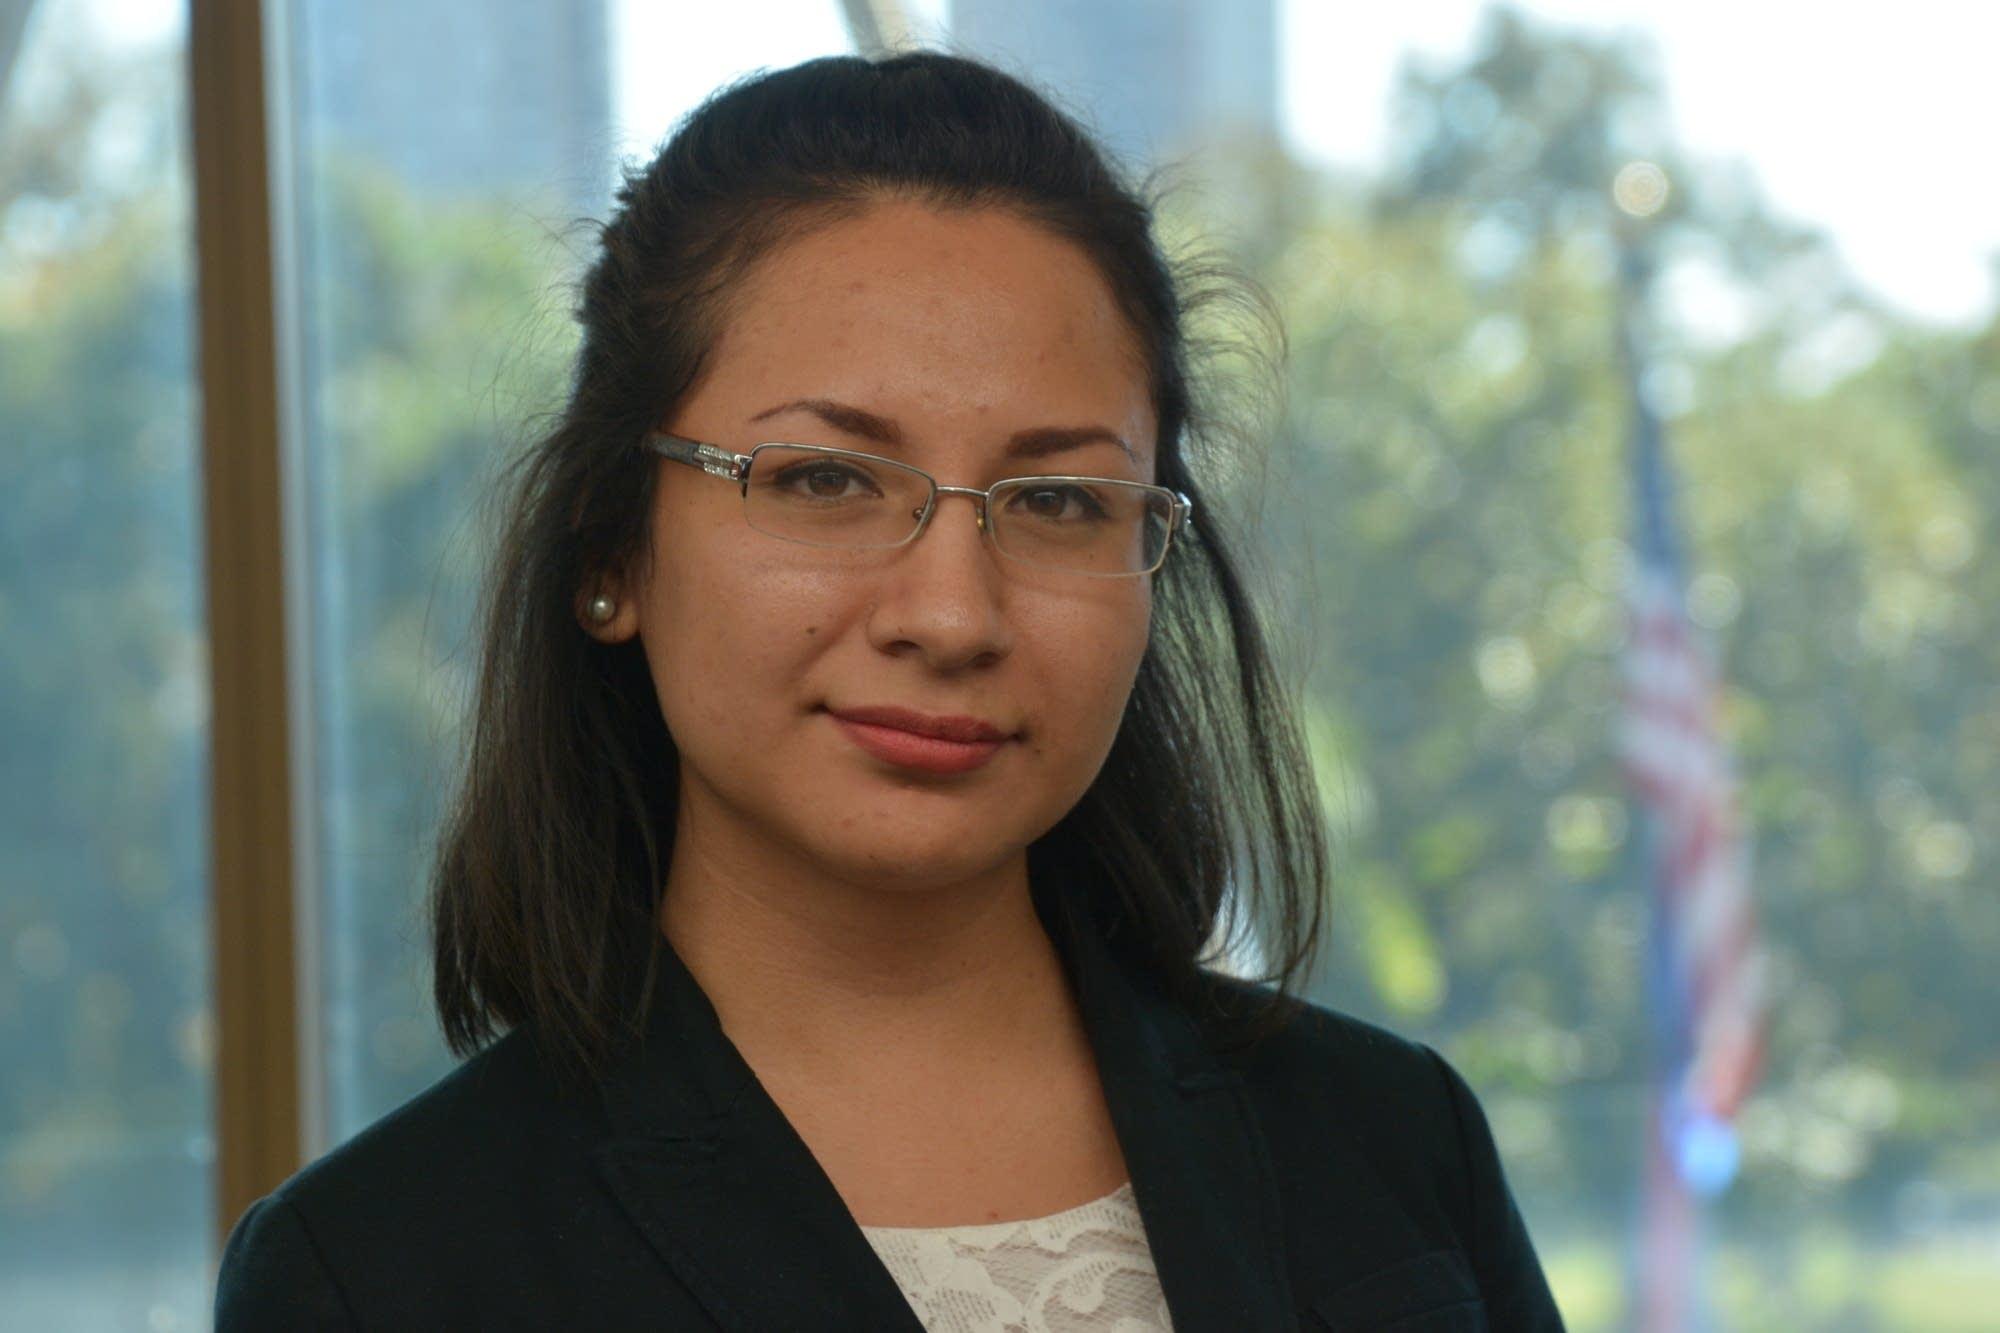 Estefania Navarro, 22, MCTC Student.